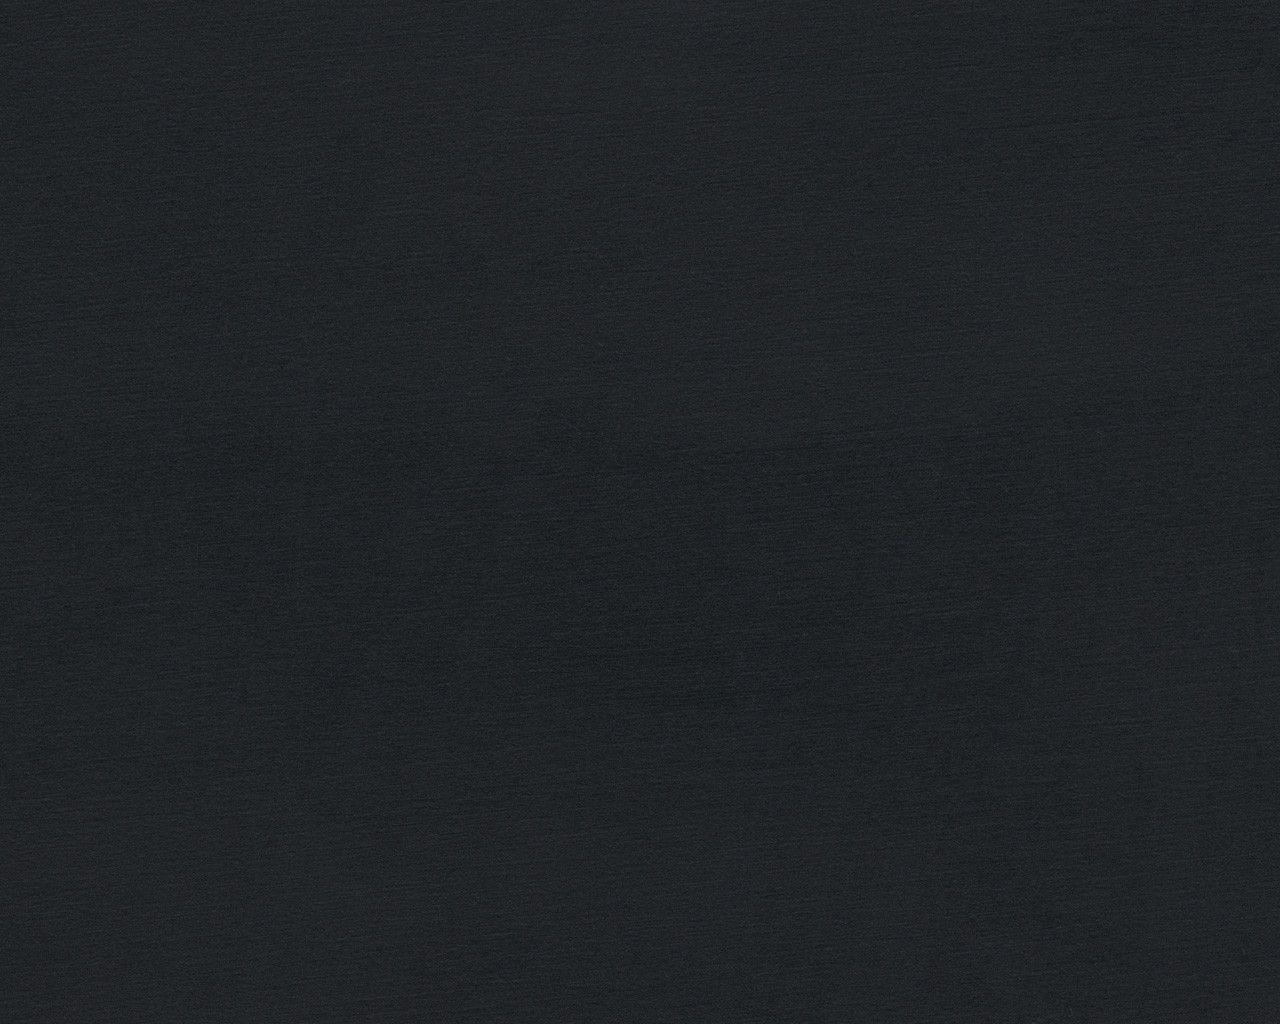 Matte Black Wallpapers Top Free Matte Black Backgrounds Wallpaperaccess